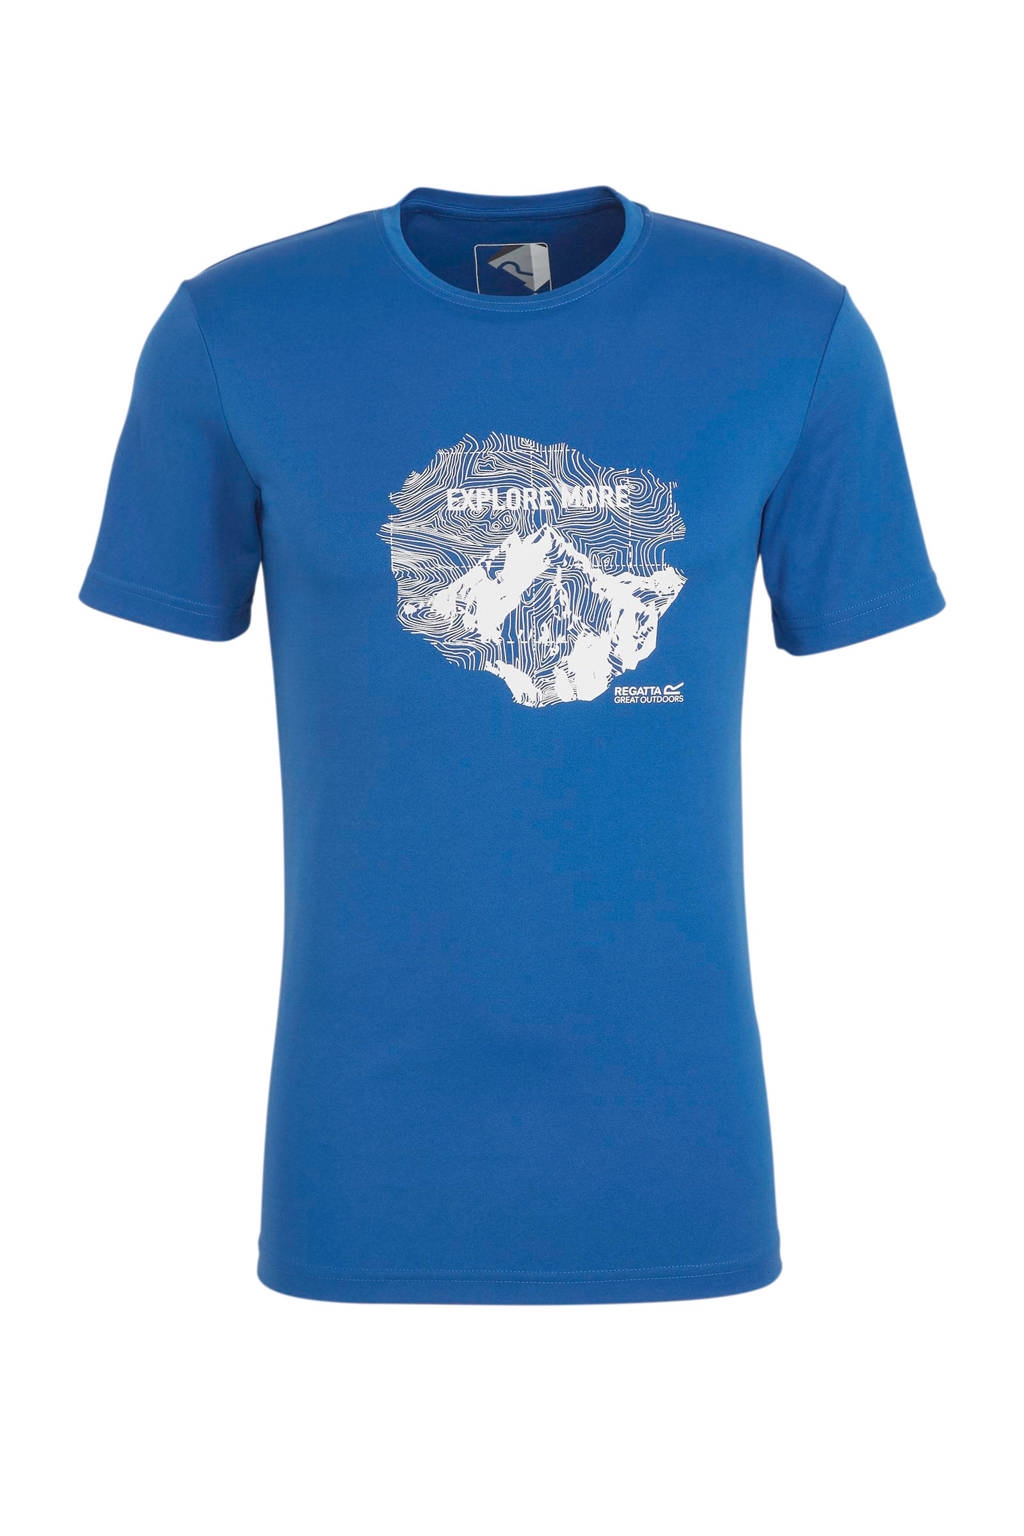 Regatta outdoor T-shirt blauw, Blauw